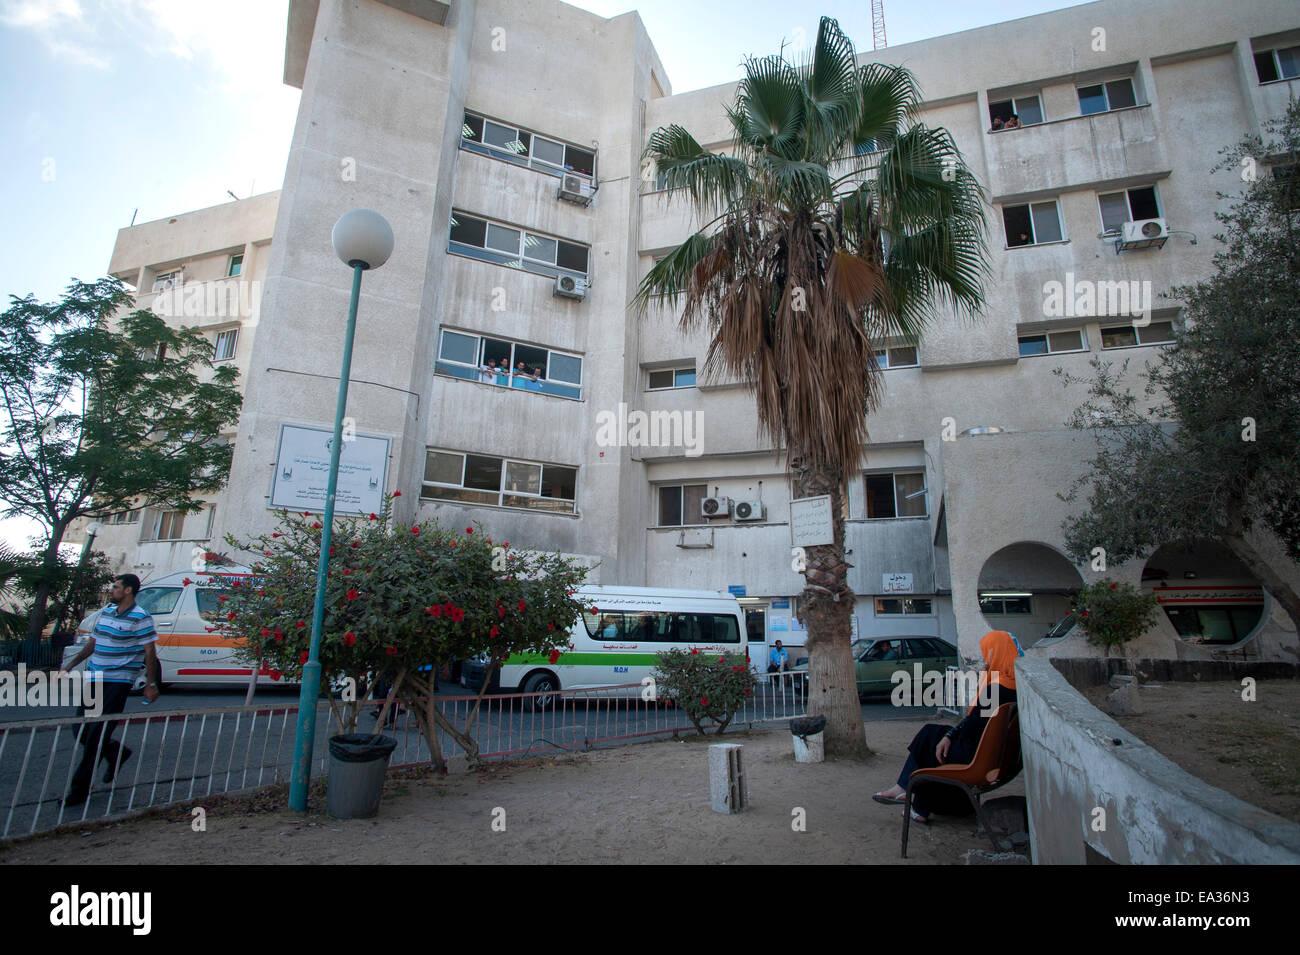 Al Shifa Hospital, Gaza City, Gaza Strip, Palestine. - Stock Image